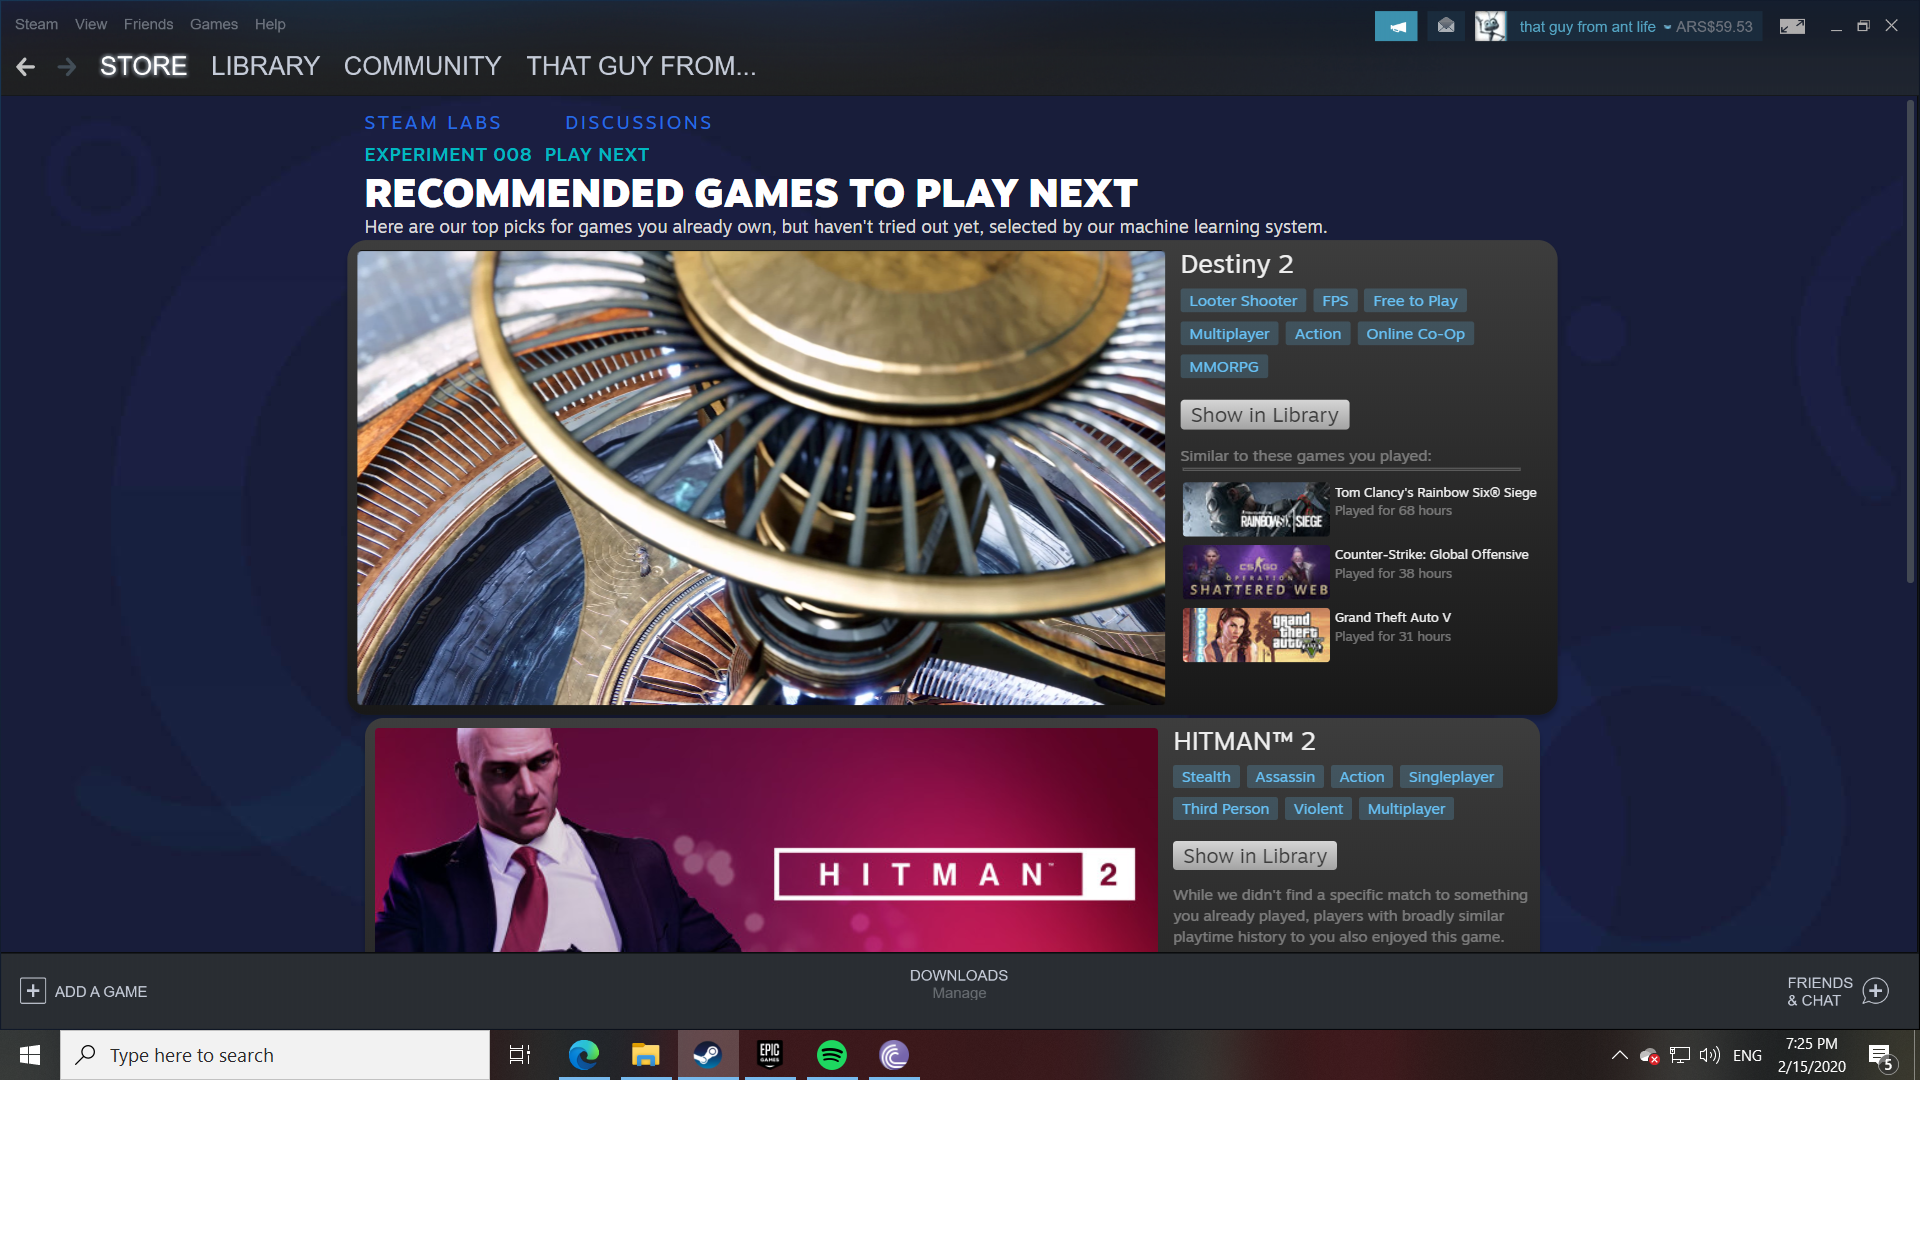 Steam Play Next